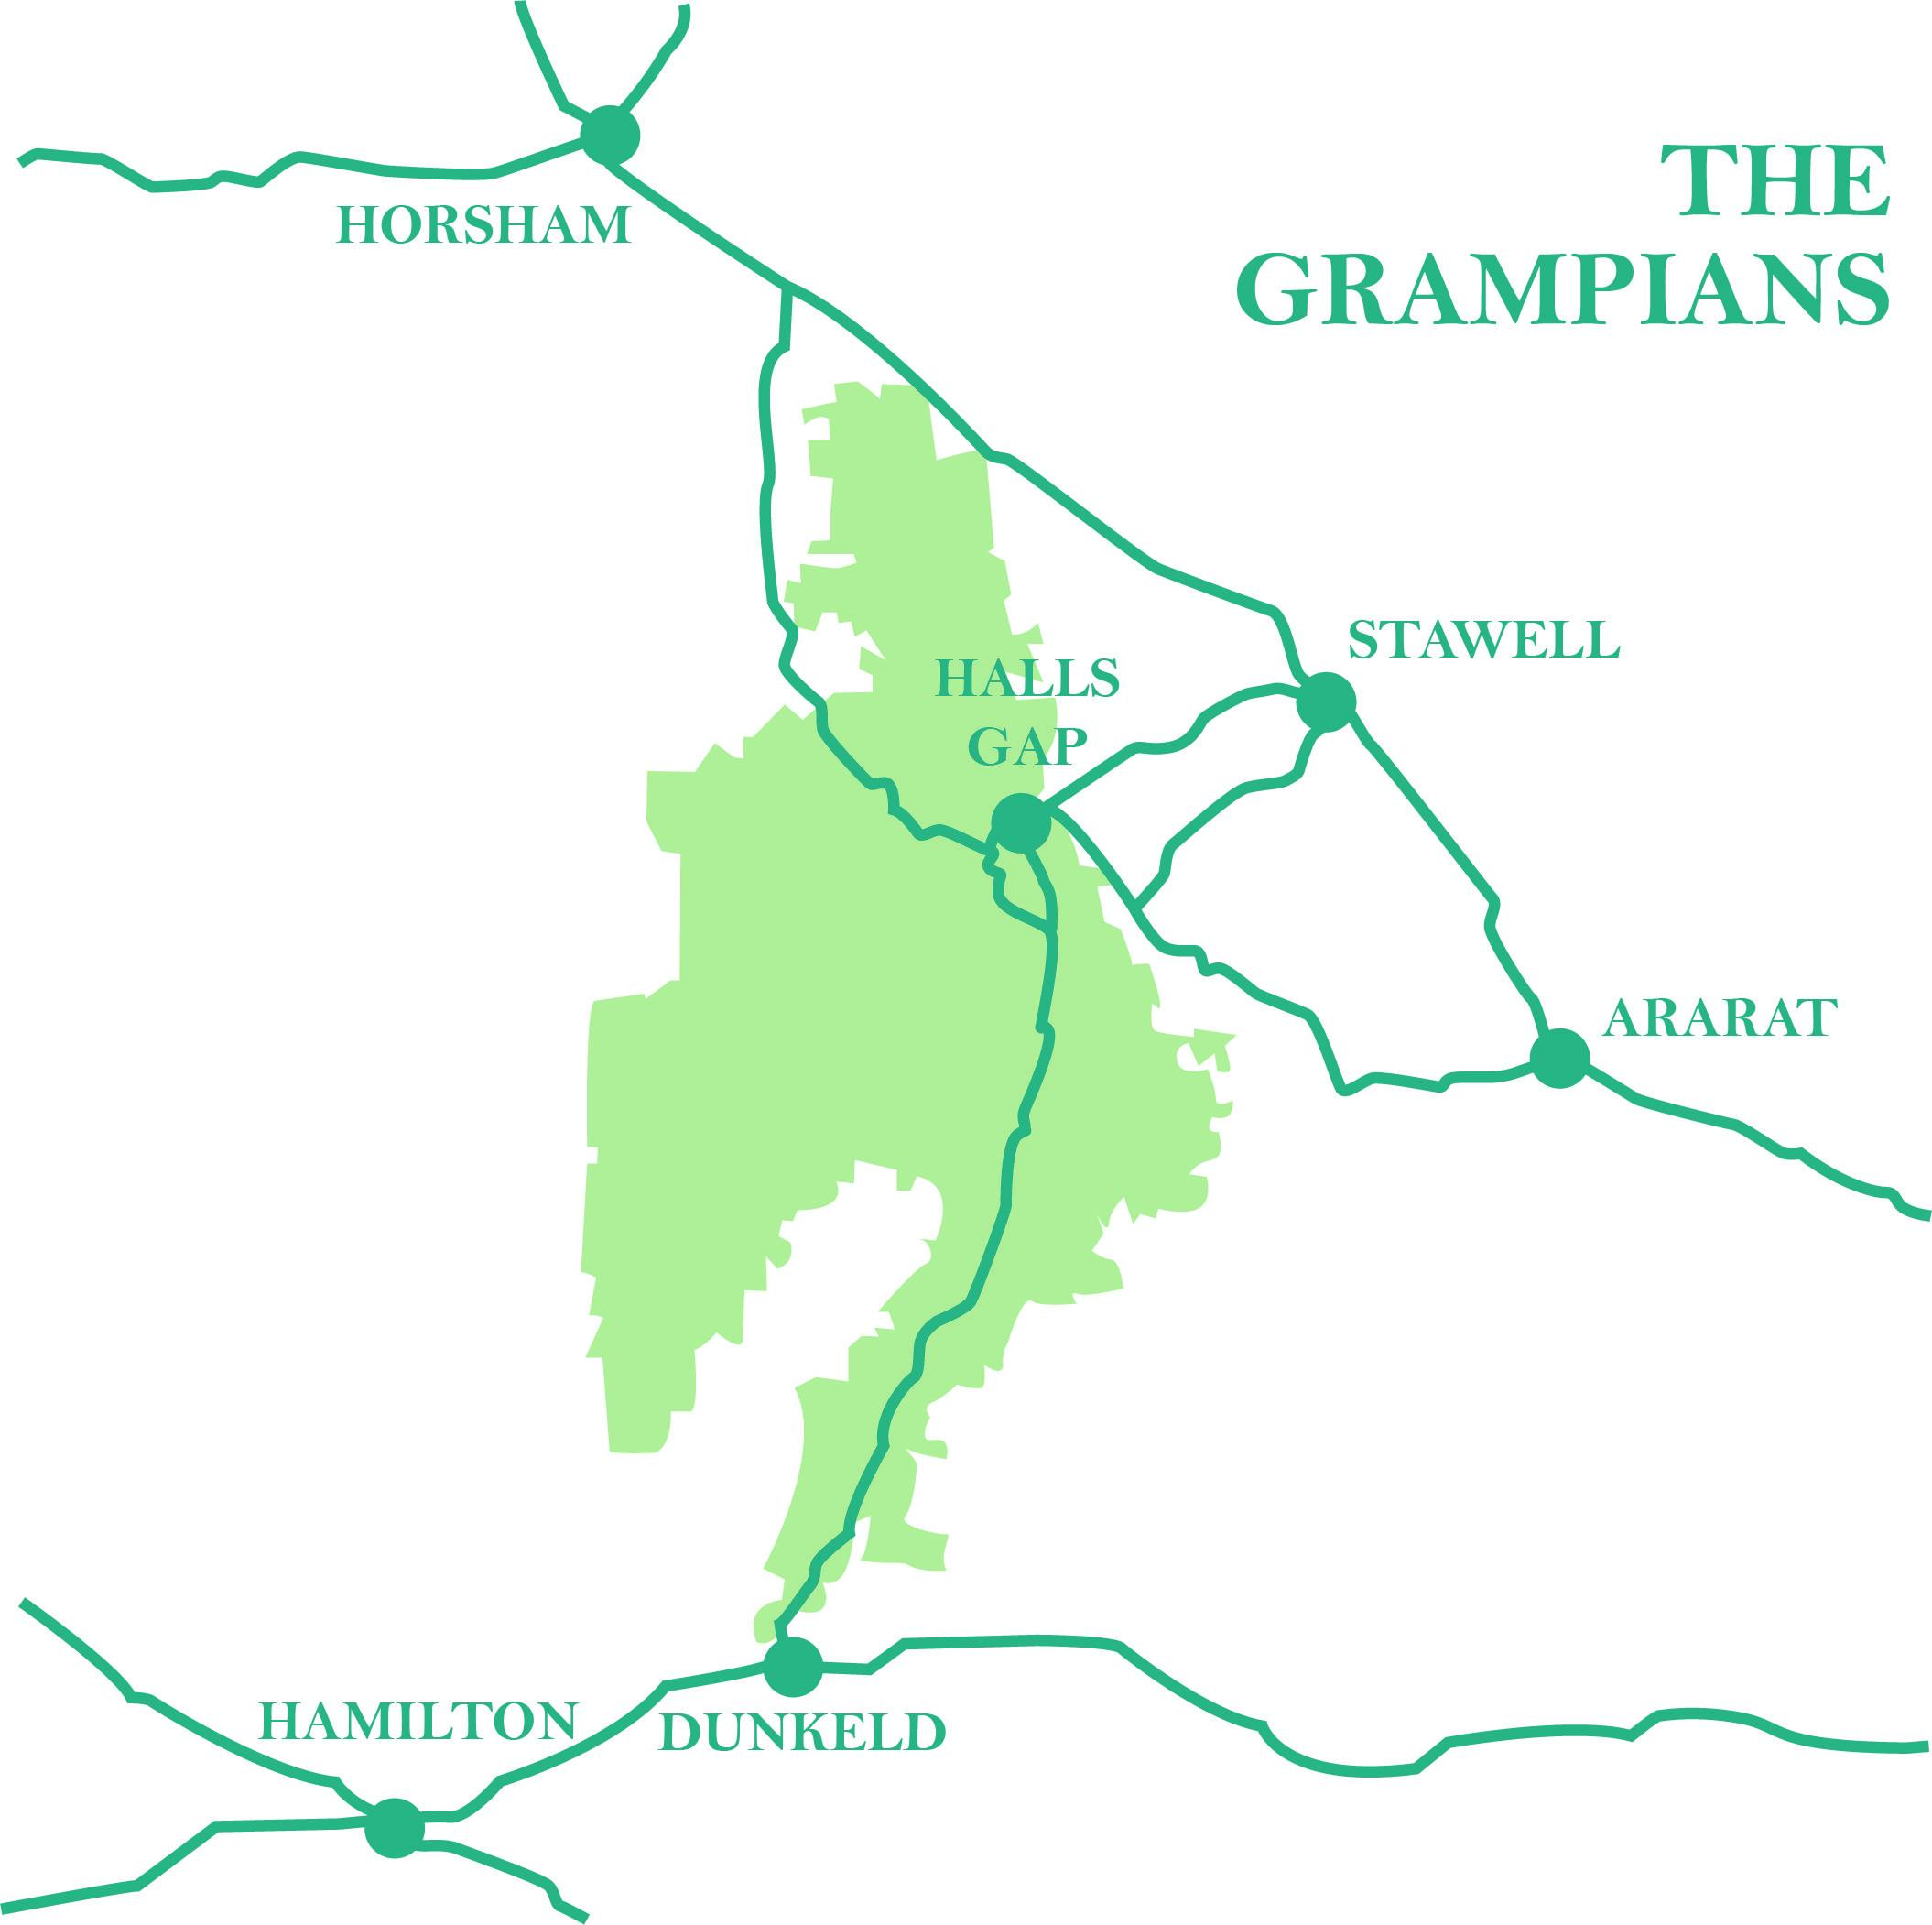 The Grampians - Halls Gap - Horsham - Stawell - Ararat - Hamilton - Dunkeld